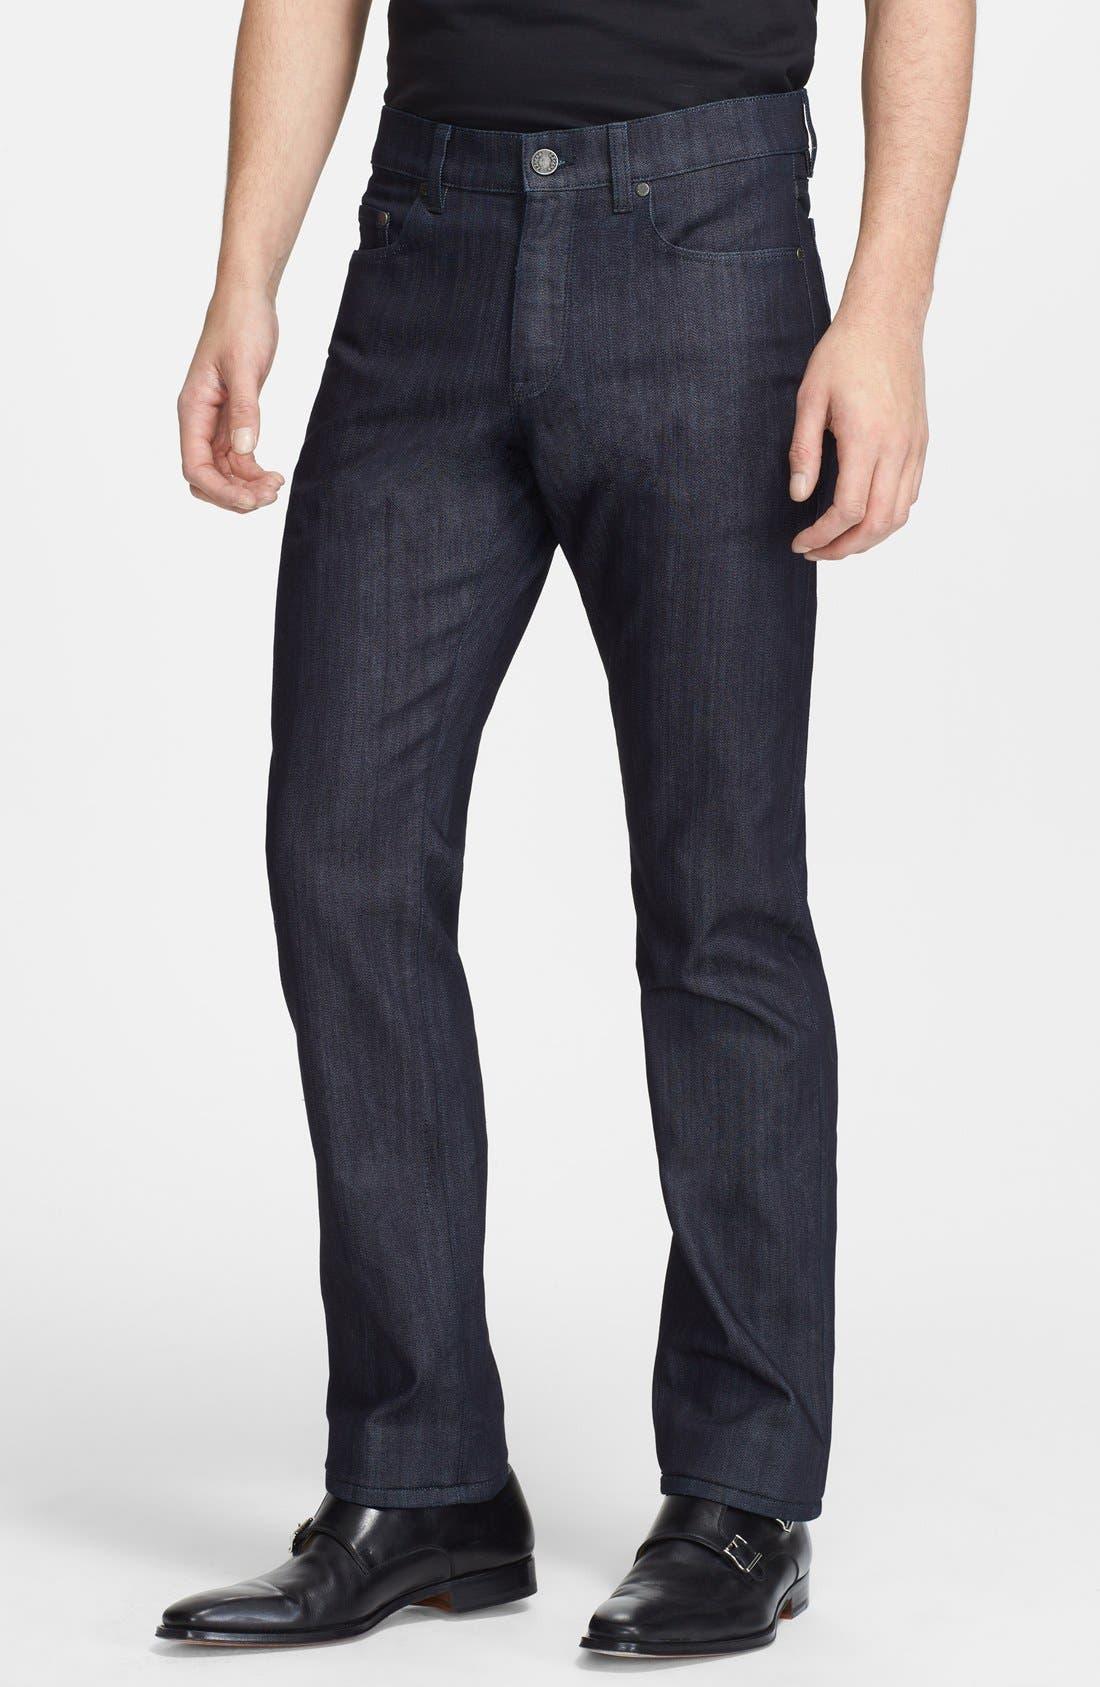 Alternate Image 1 Selected - Z Zegna Slim Straight Leg Jeans (Navy Solid)